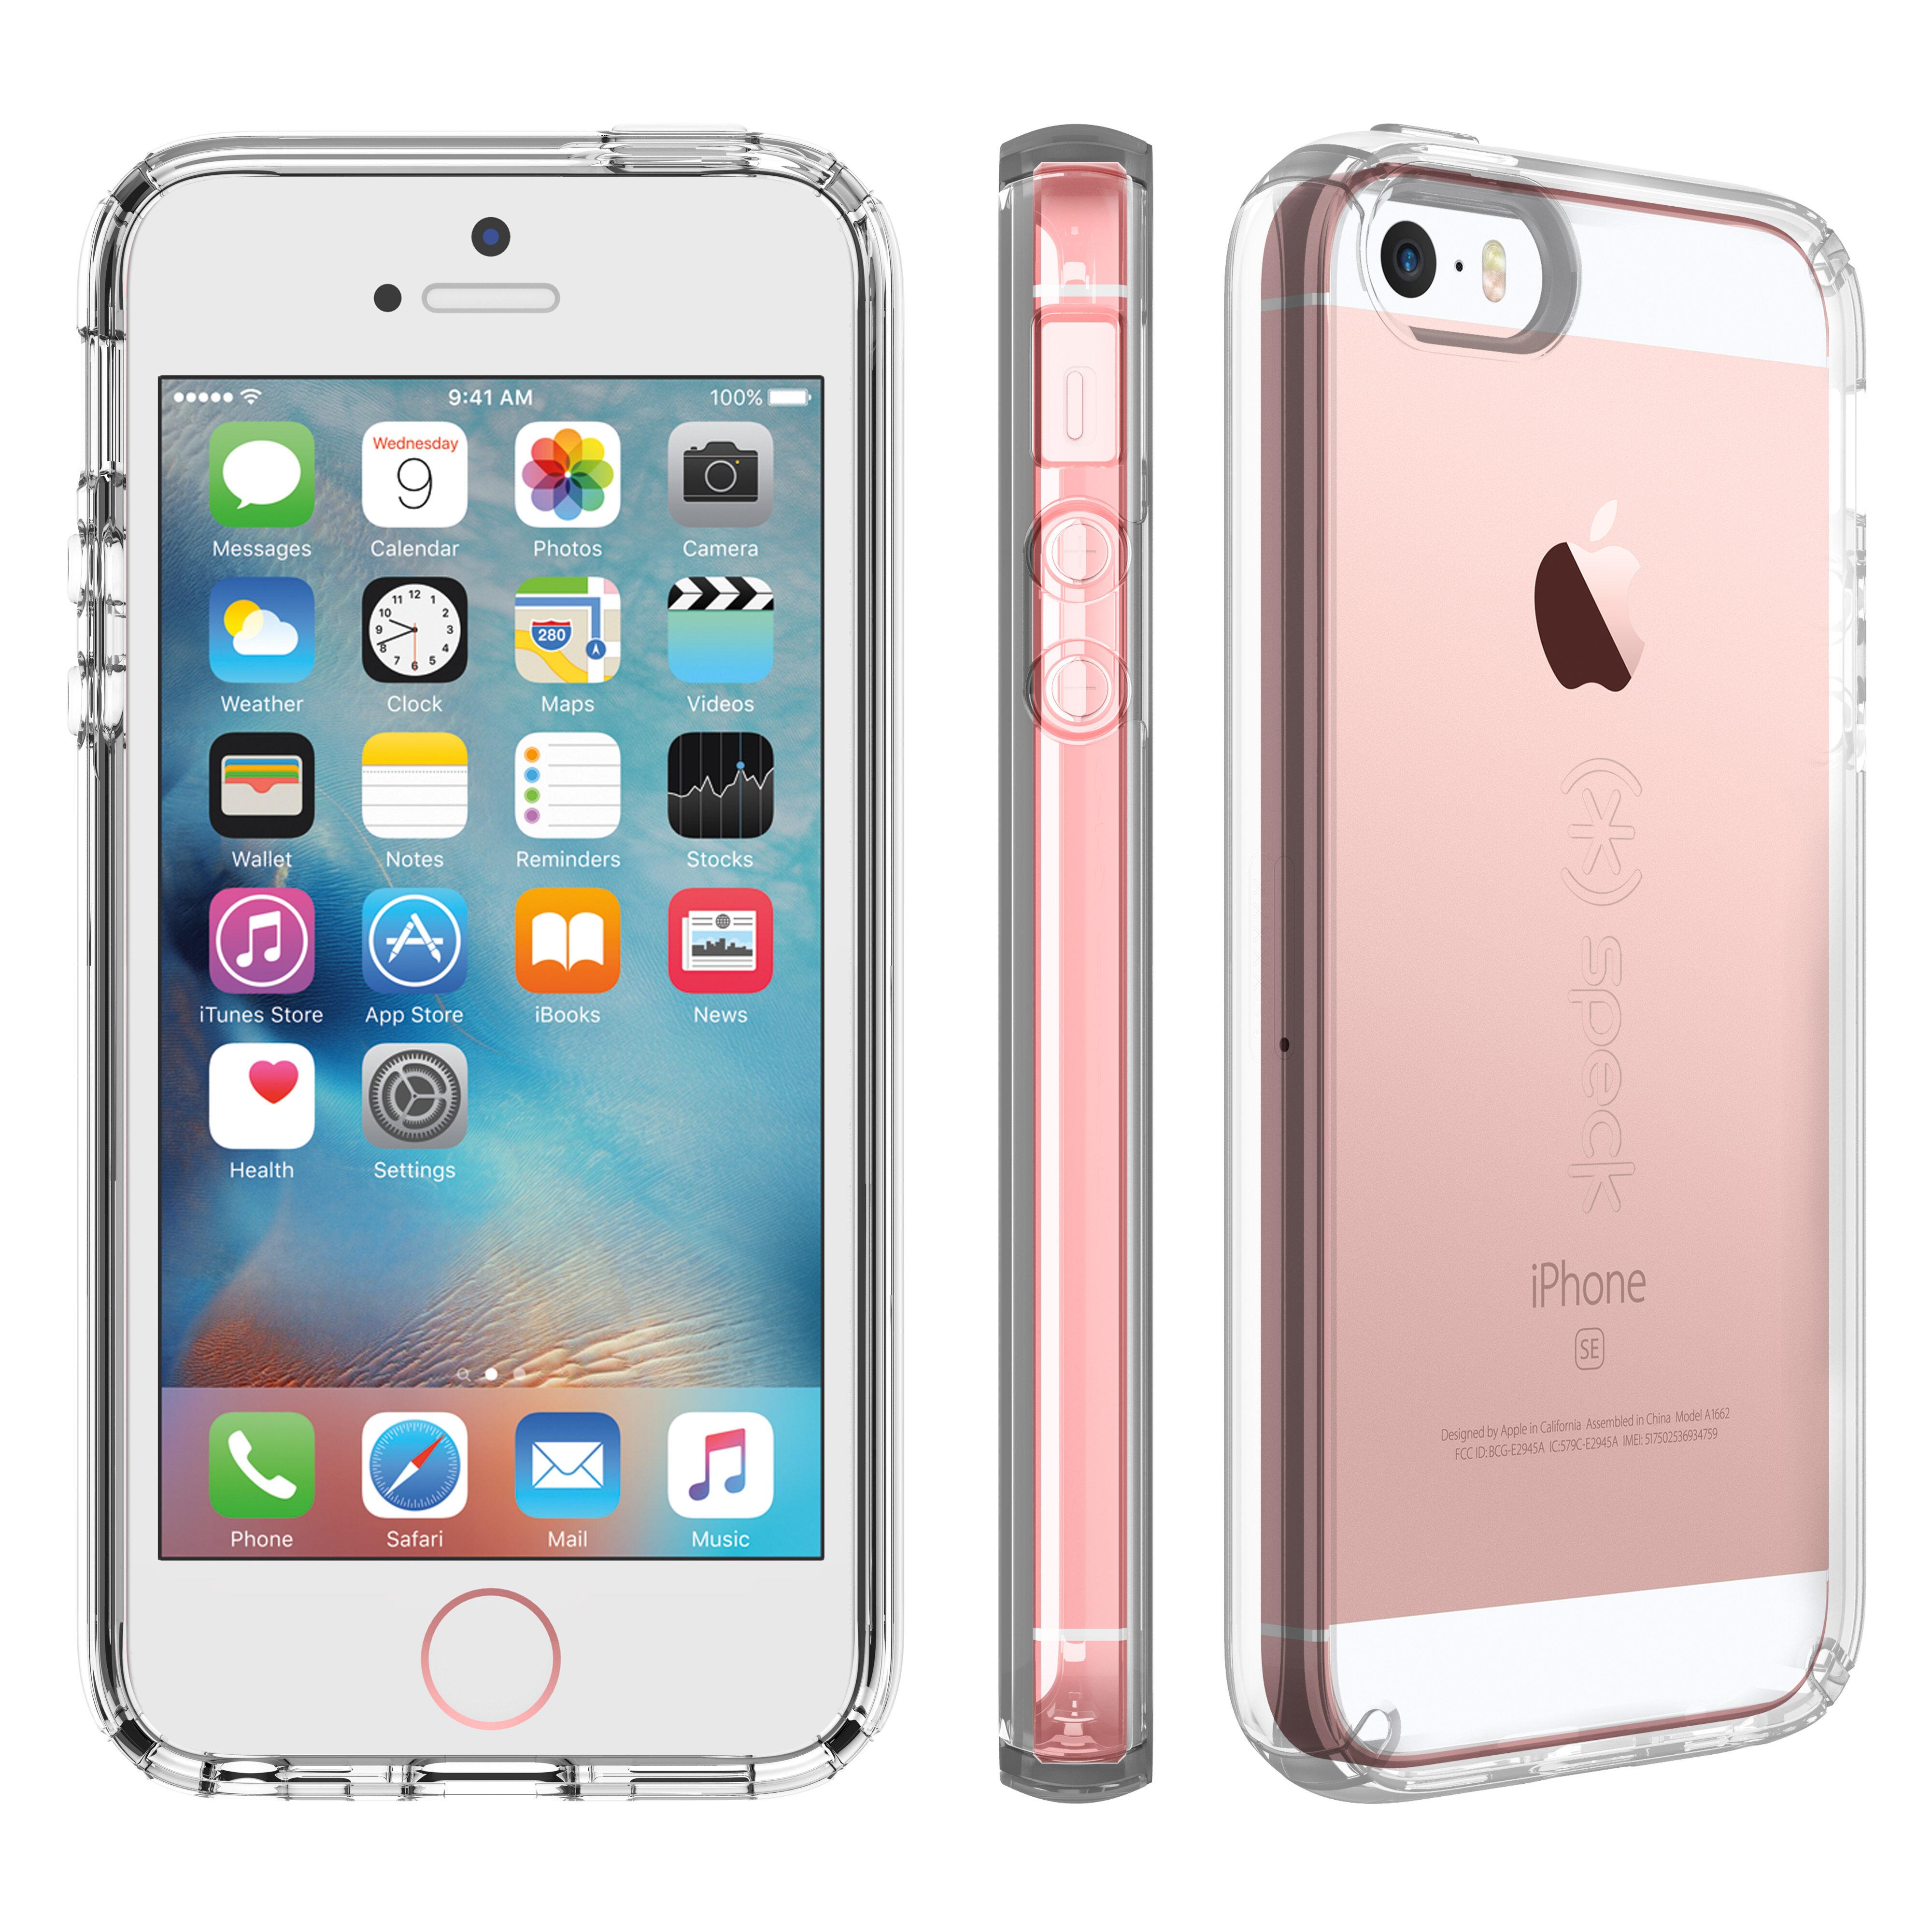 Clear IPhone SE, IPhone 5s u0026 IPhone 5 Cases - 1500x1500 - jpeg